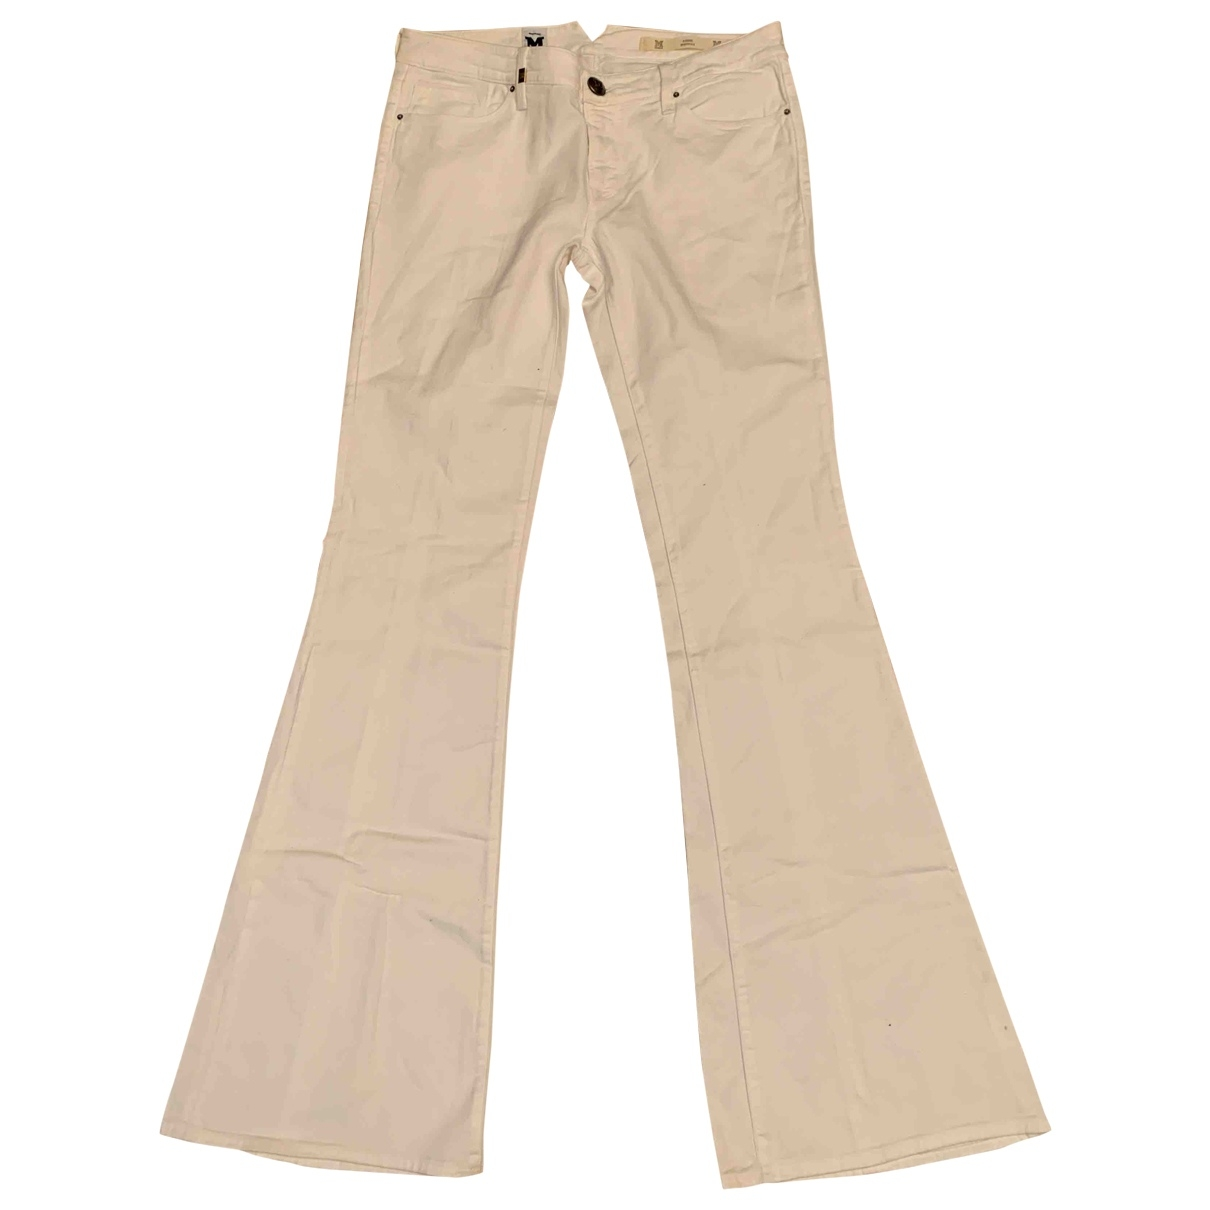 M Missoni \N White Cotton - elasthane Jeans for Women 32 US